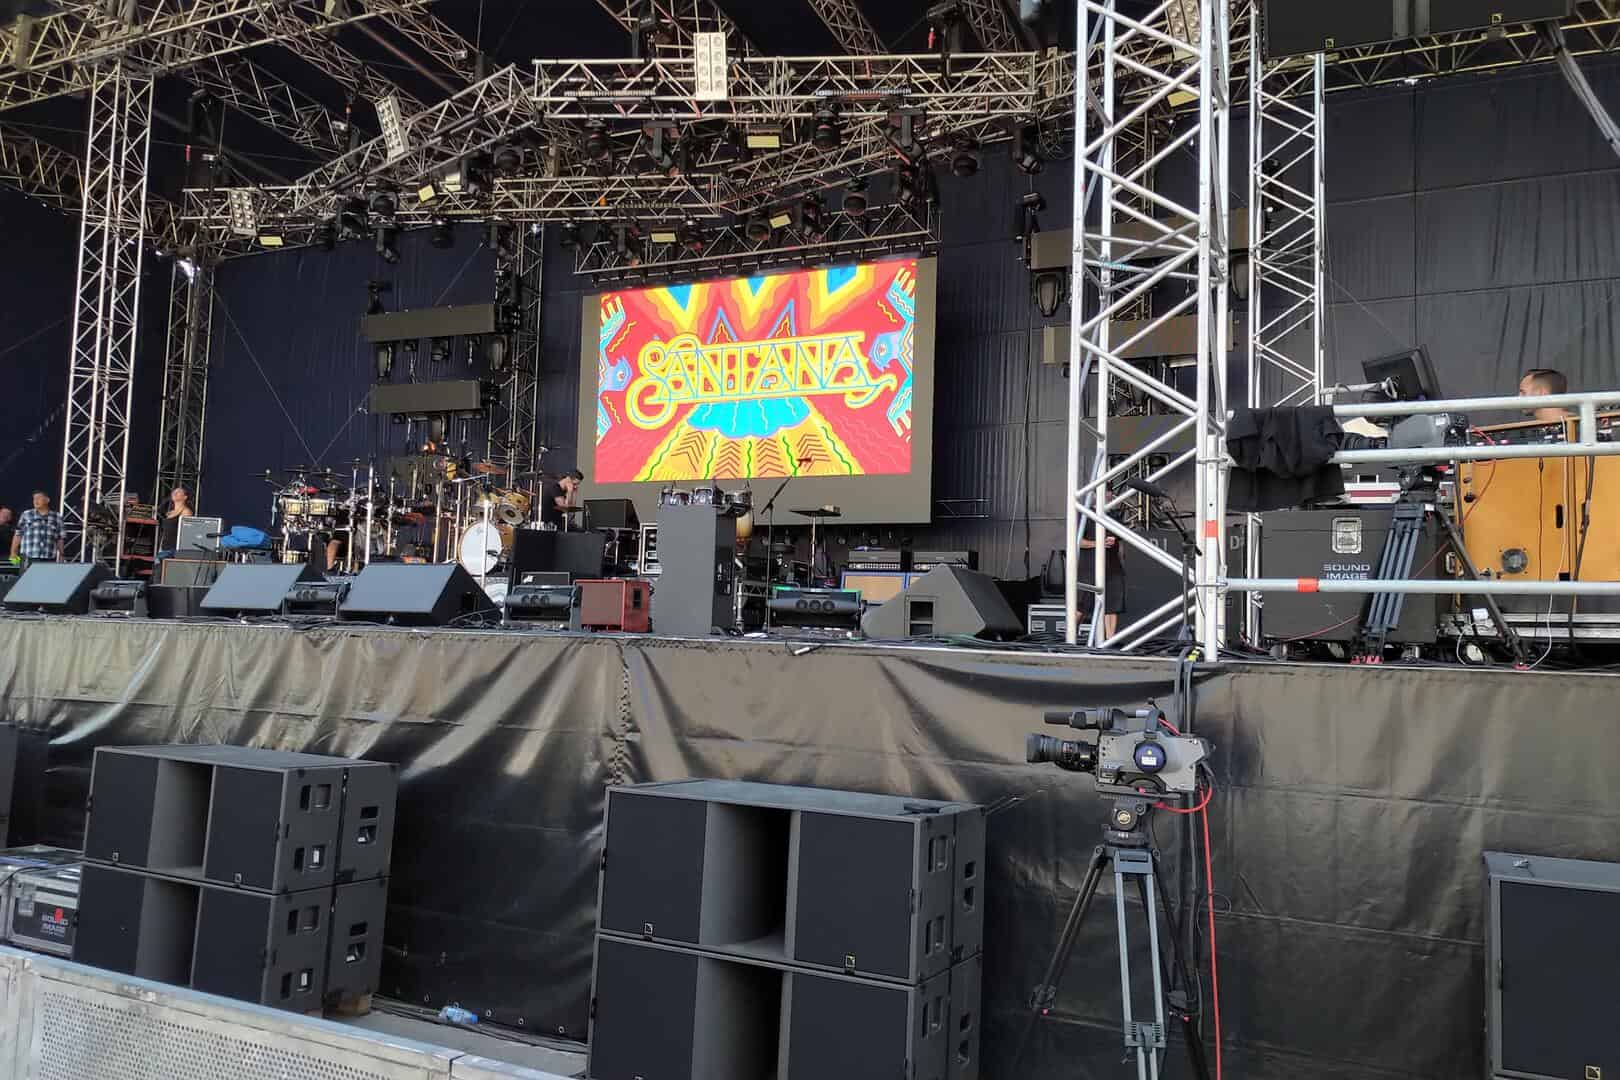 Carlos Santana Tournee